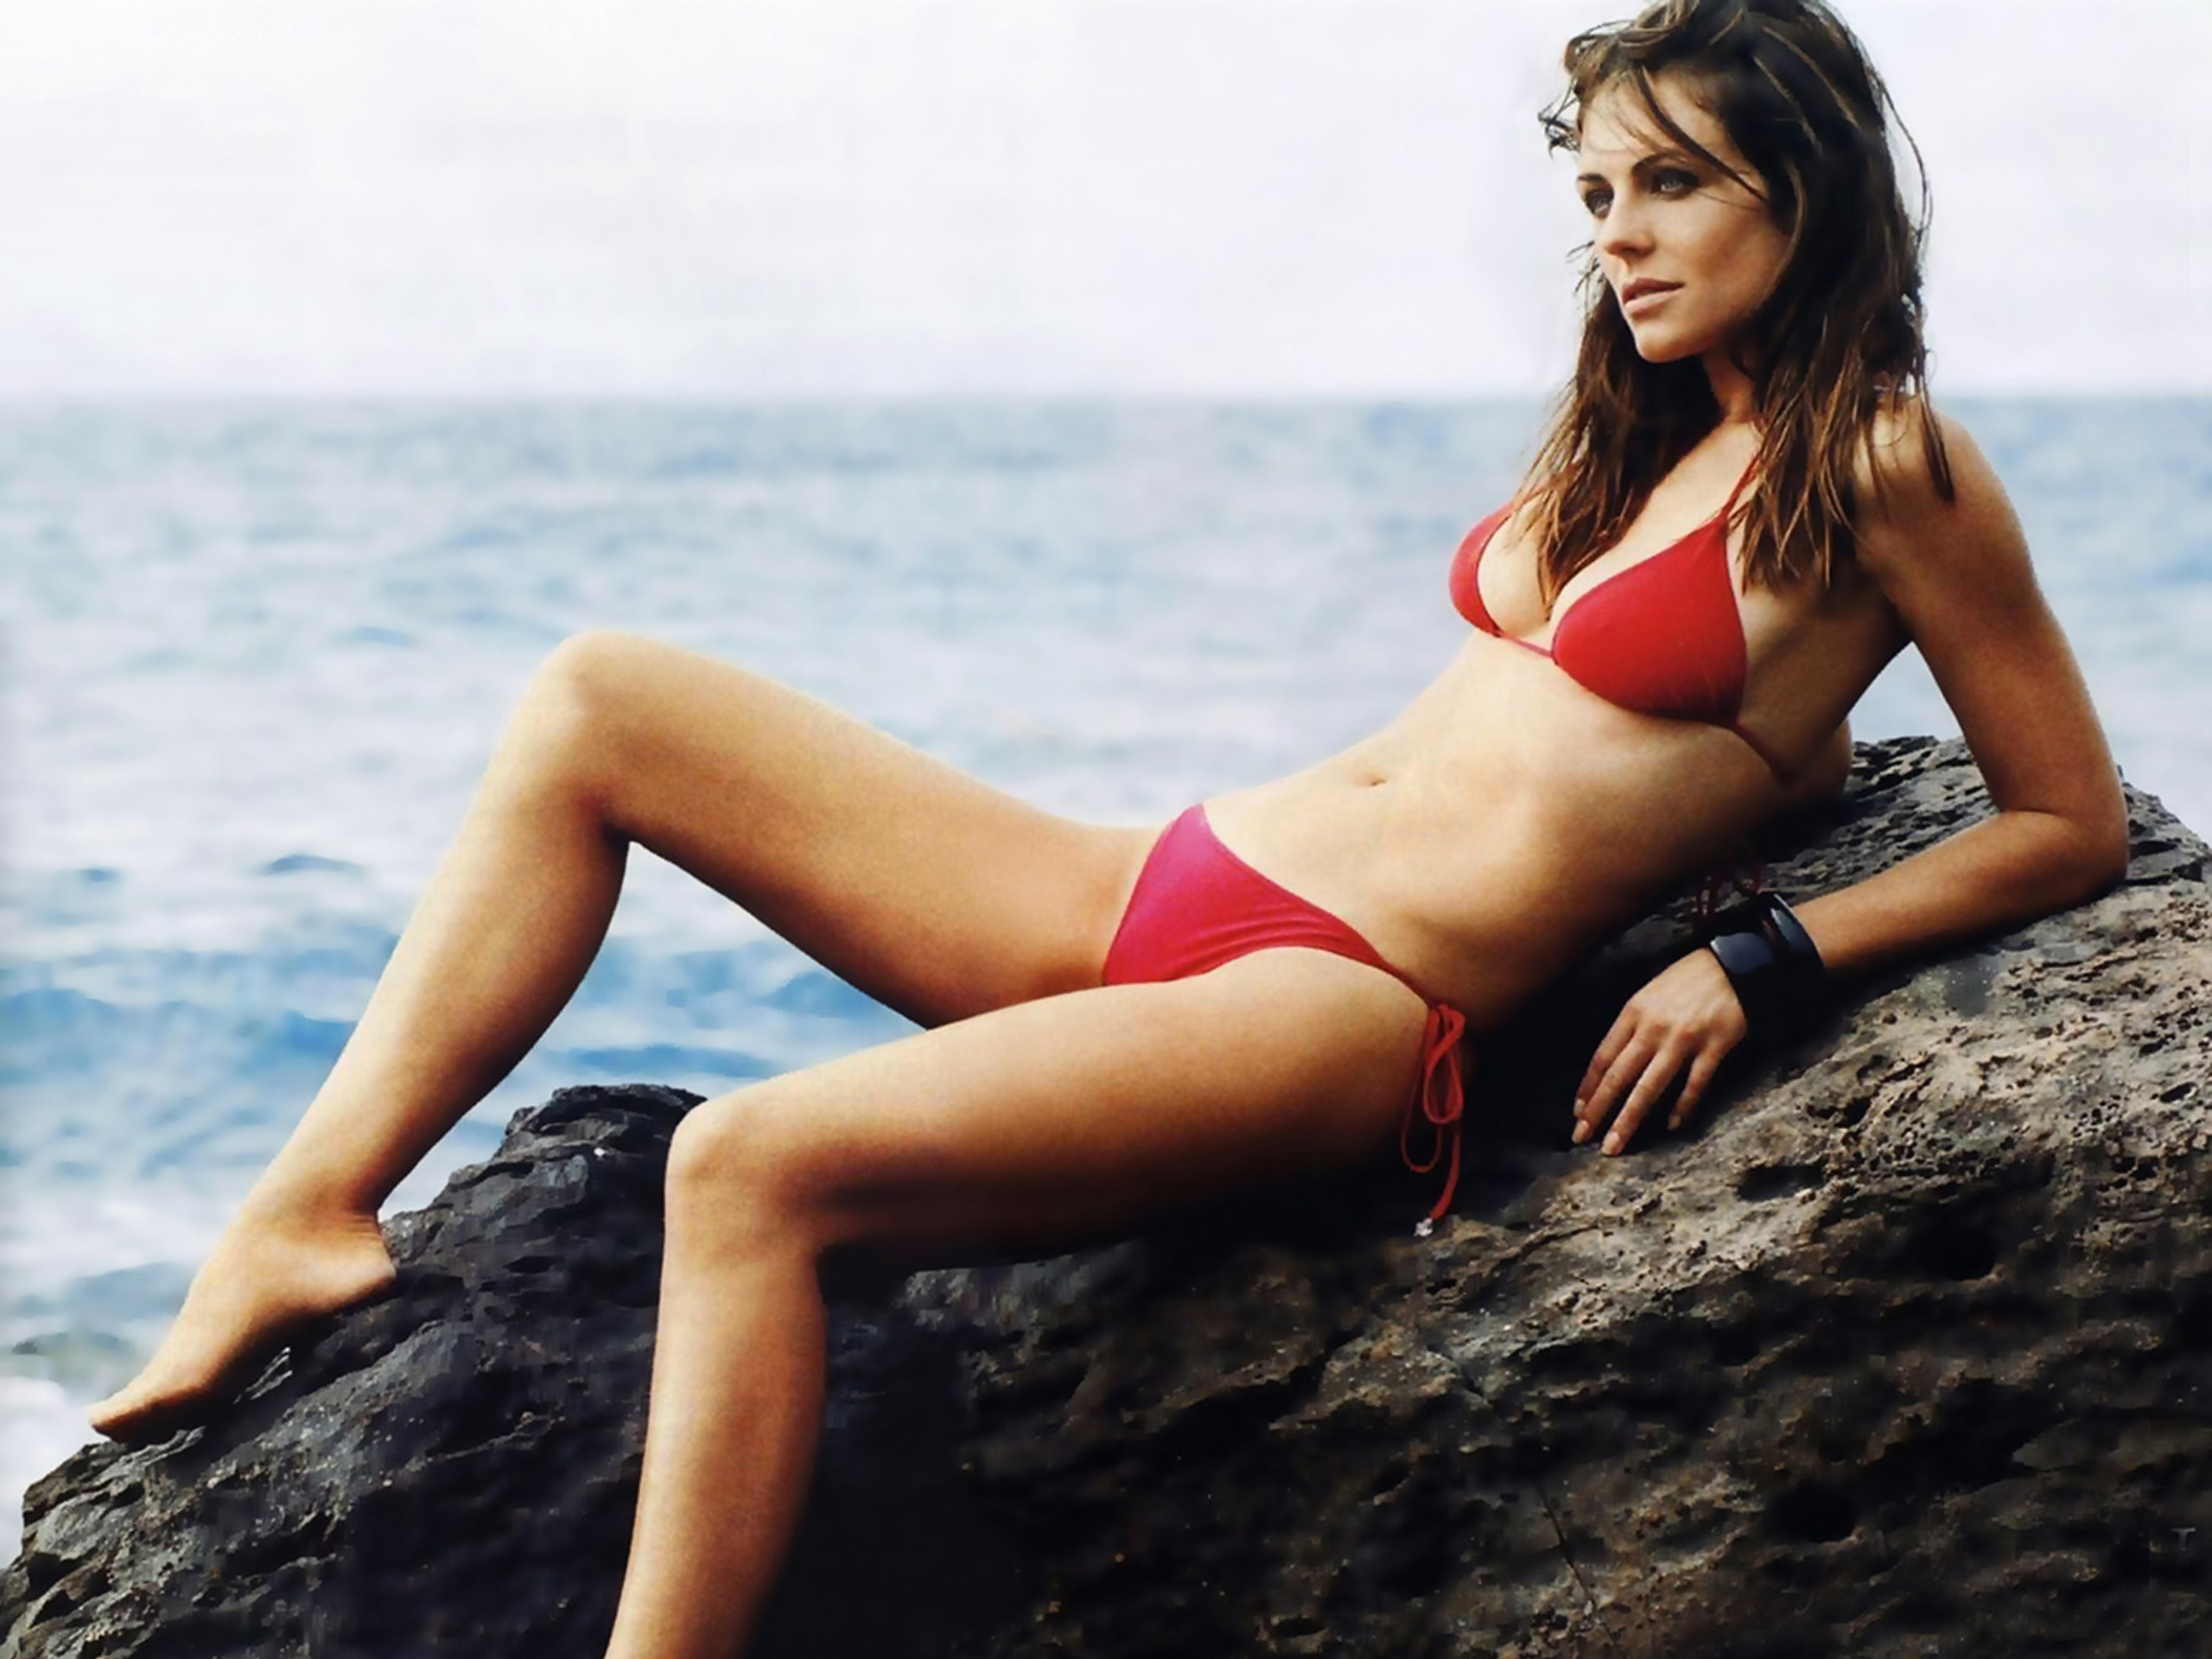 Elizabeth Hurley Hot And Sexy Leaked Bikini Photoshoot